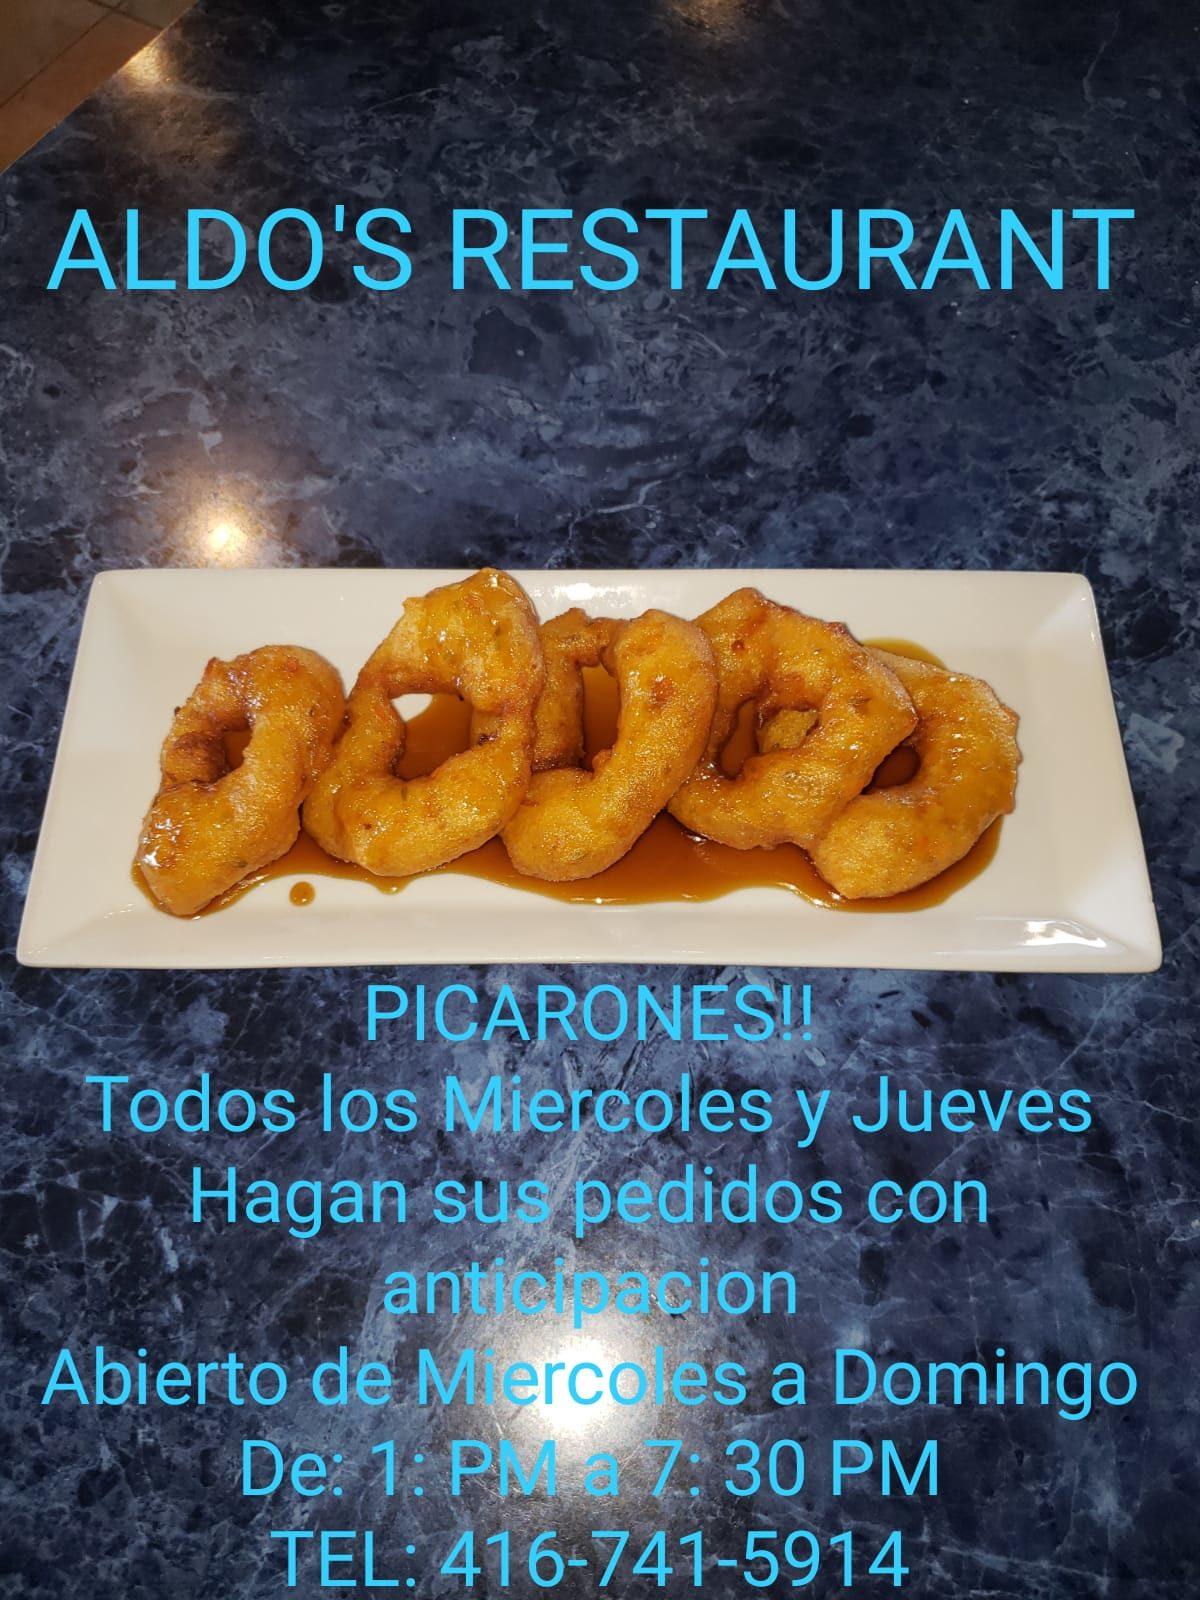 Aldo's Restaurante: Picarones!